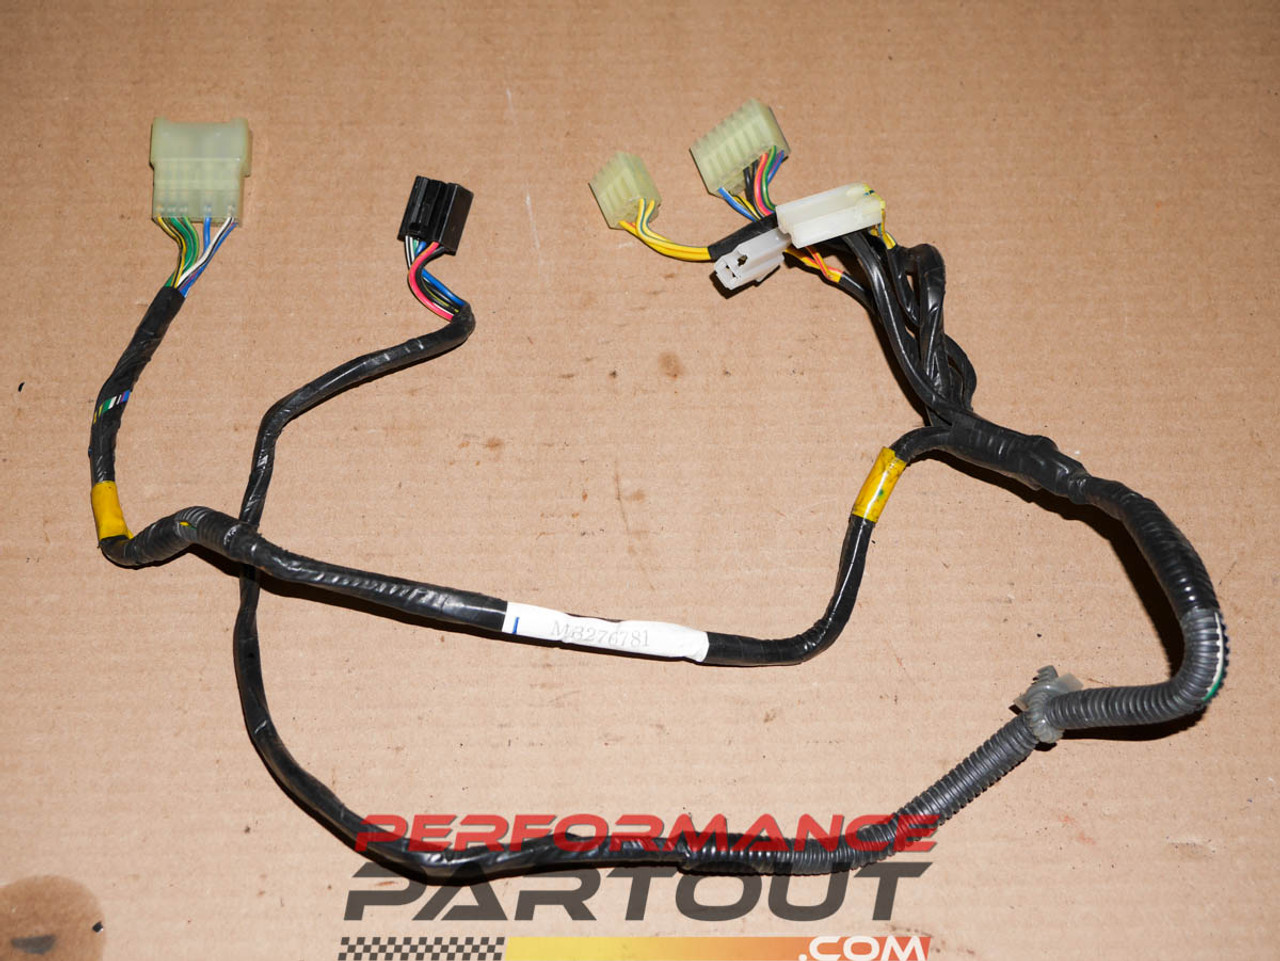 AC wiring harness 1G DSM GVR4 - Performance PartoutPerformance Partout